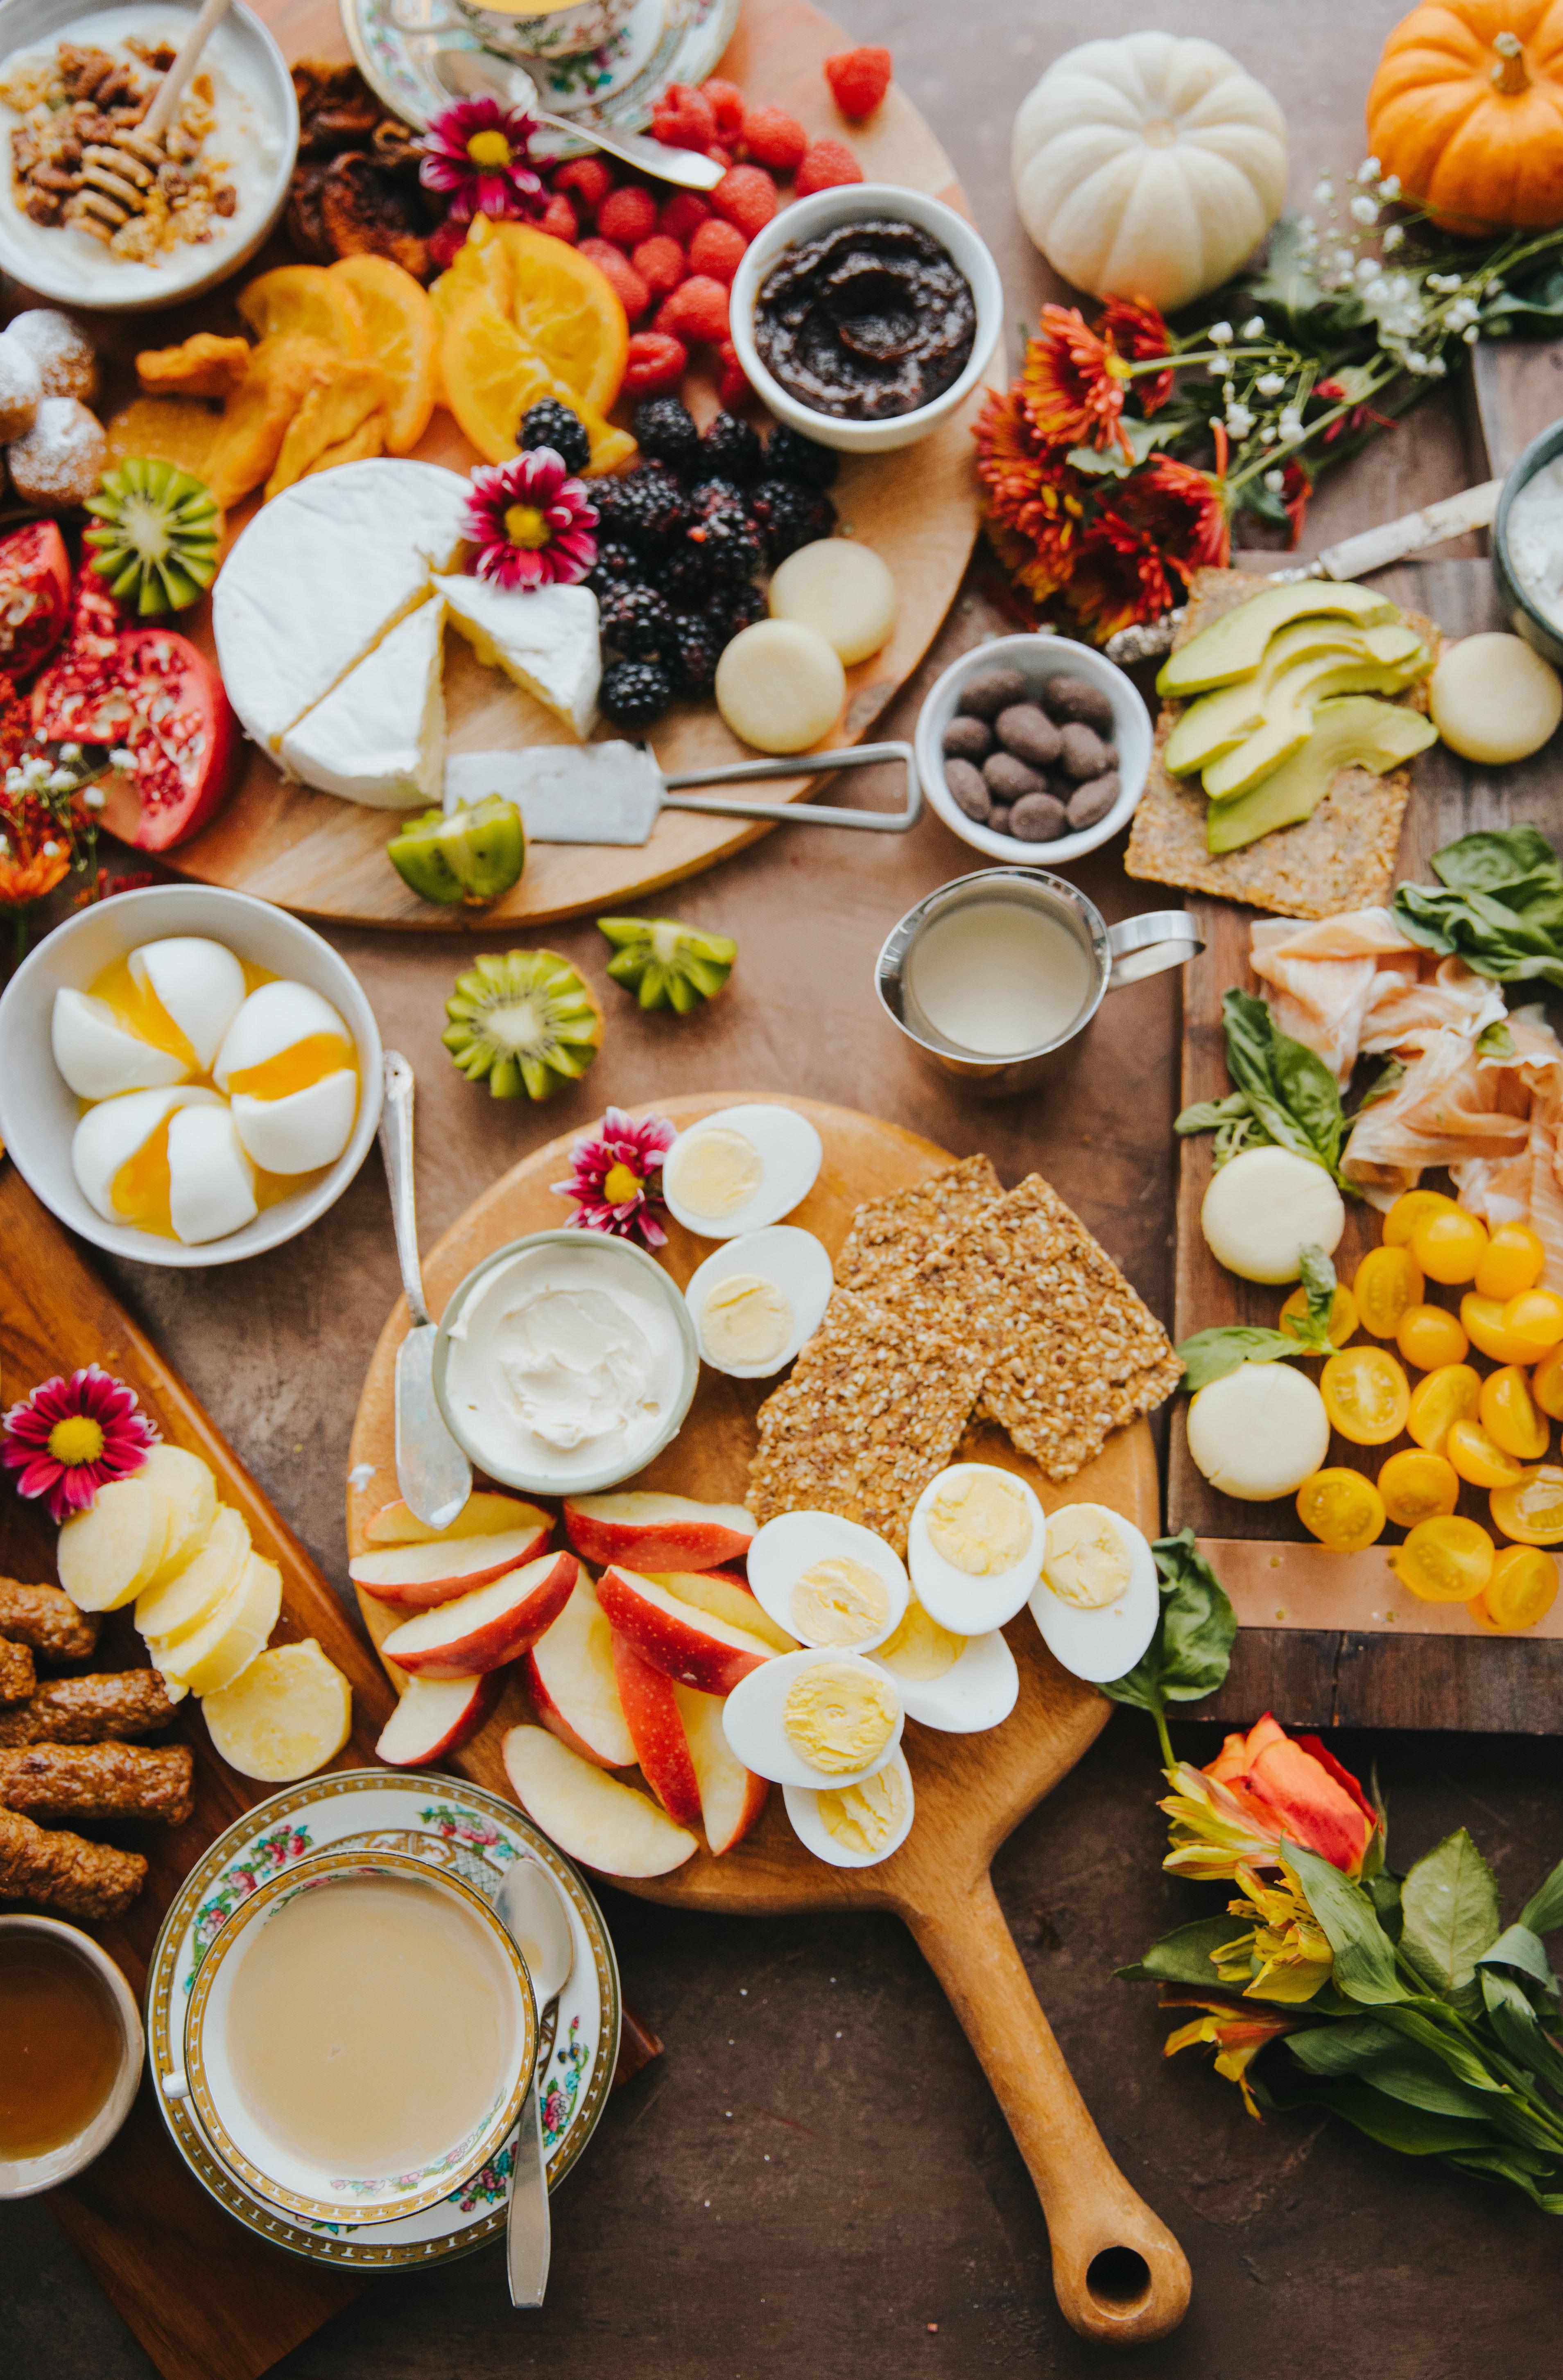 Food Allergy Tests